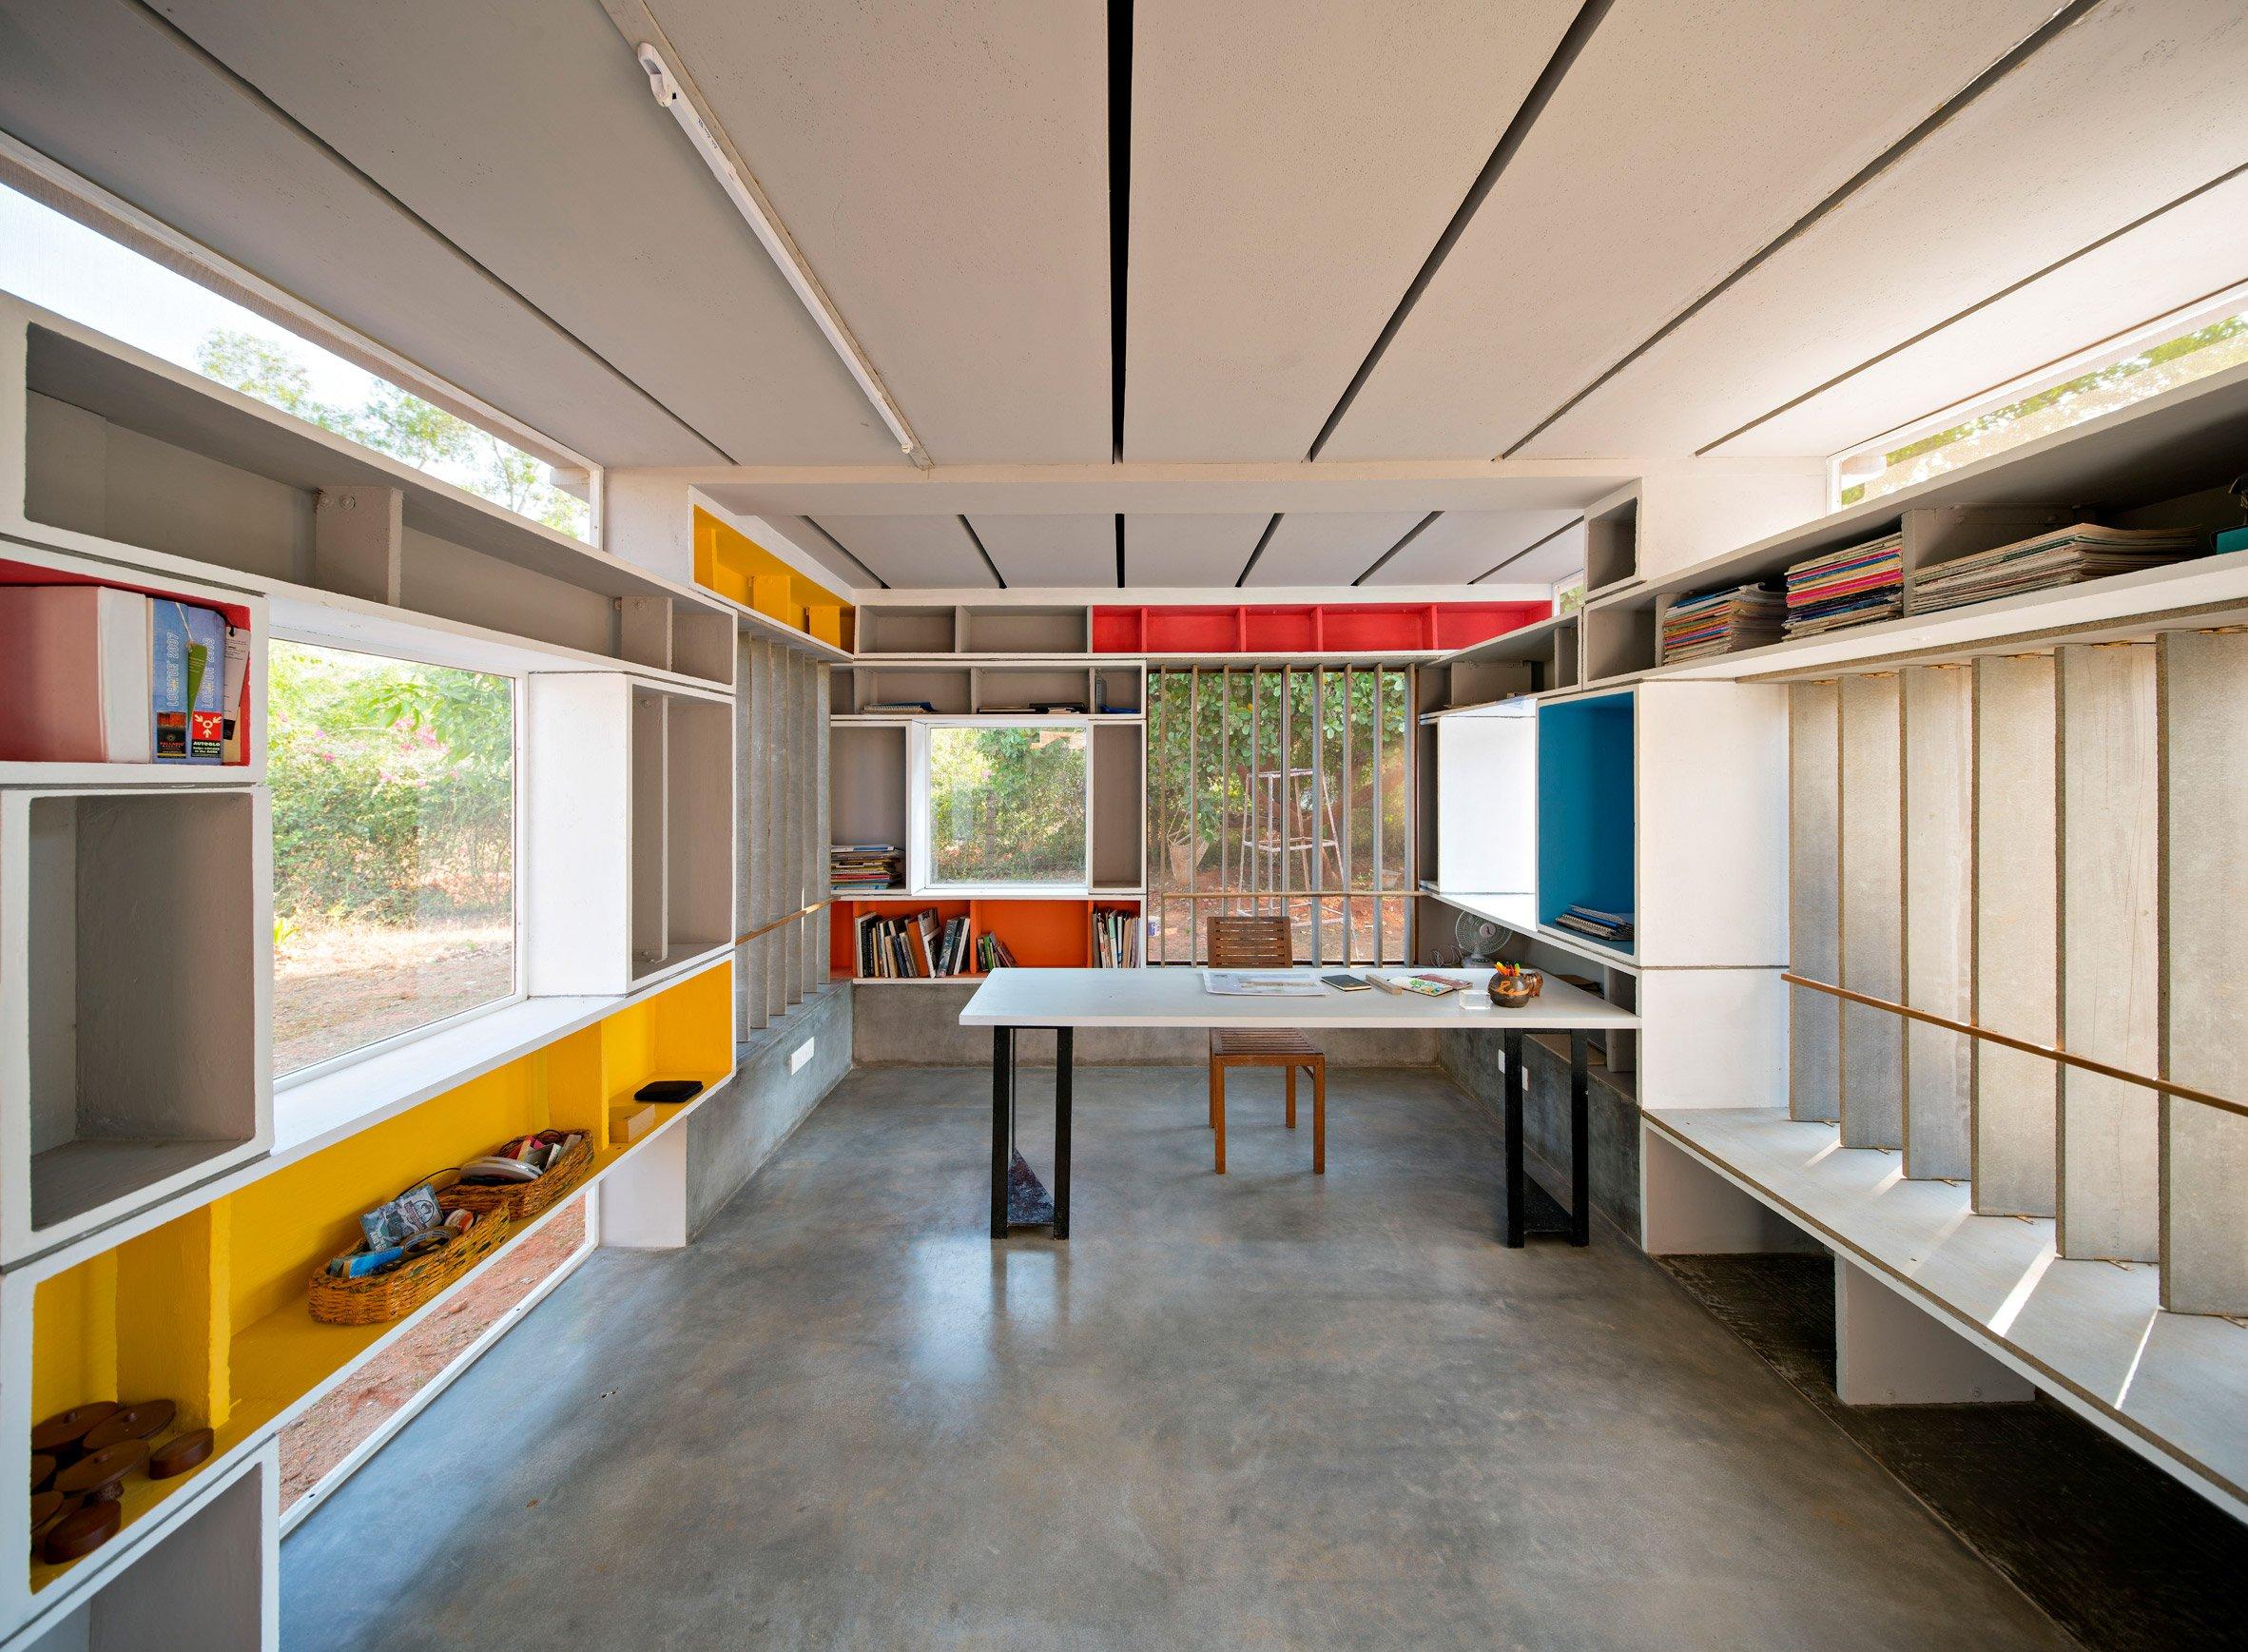 Anupama Kundoo architecture: Full Fill Homes, 2015